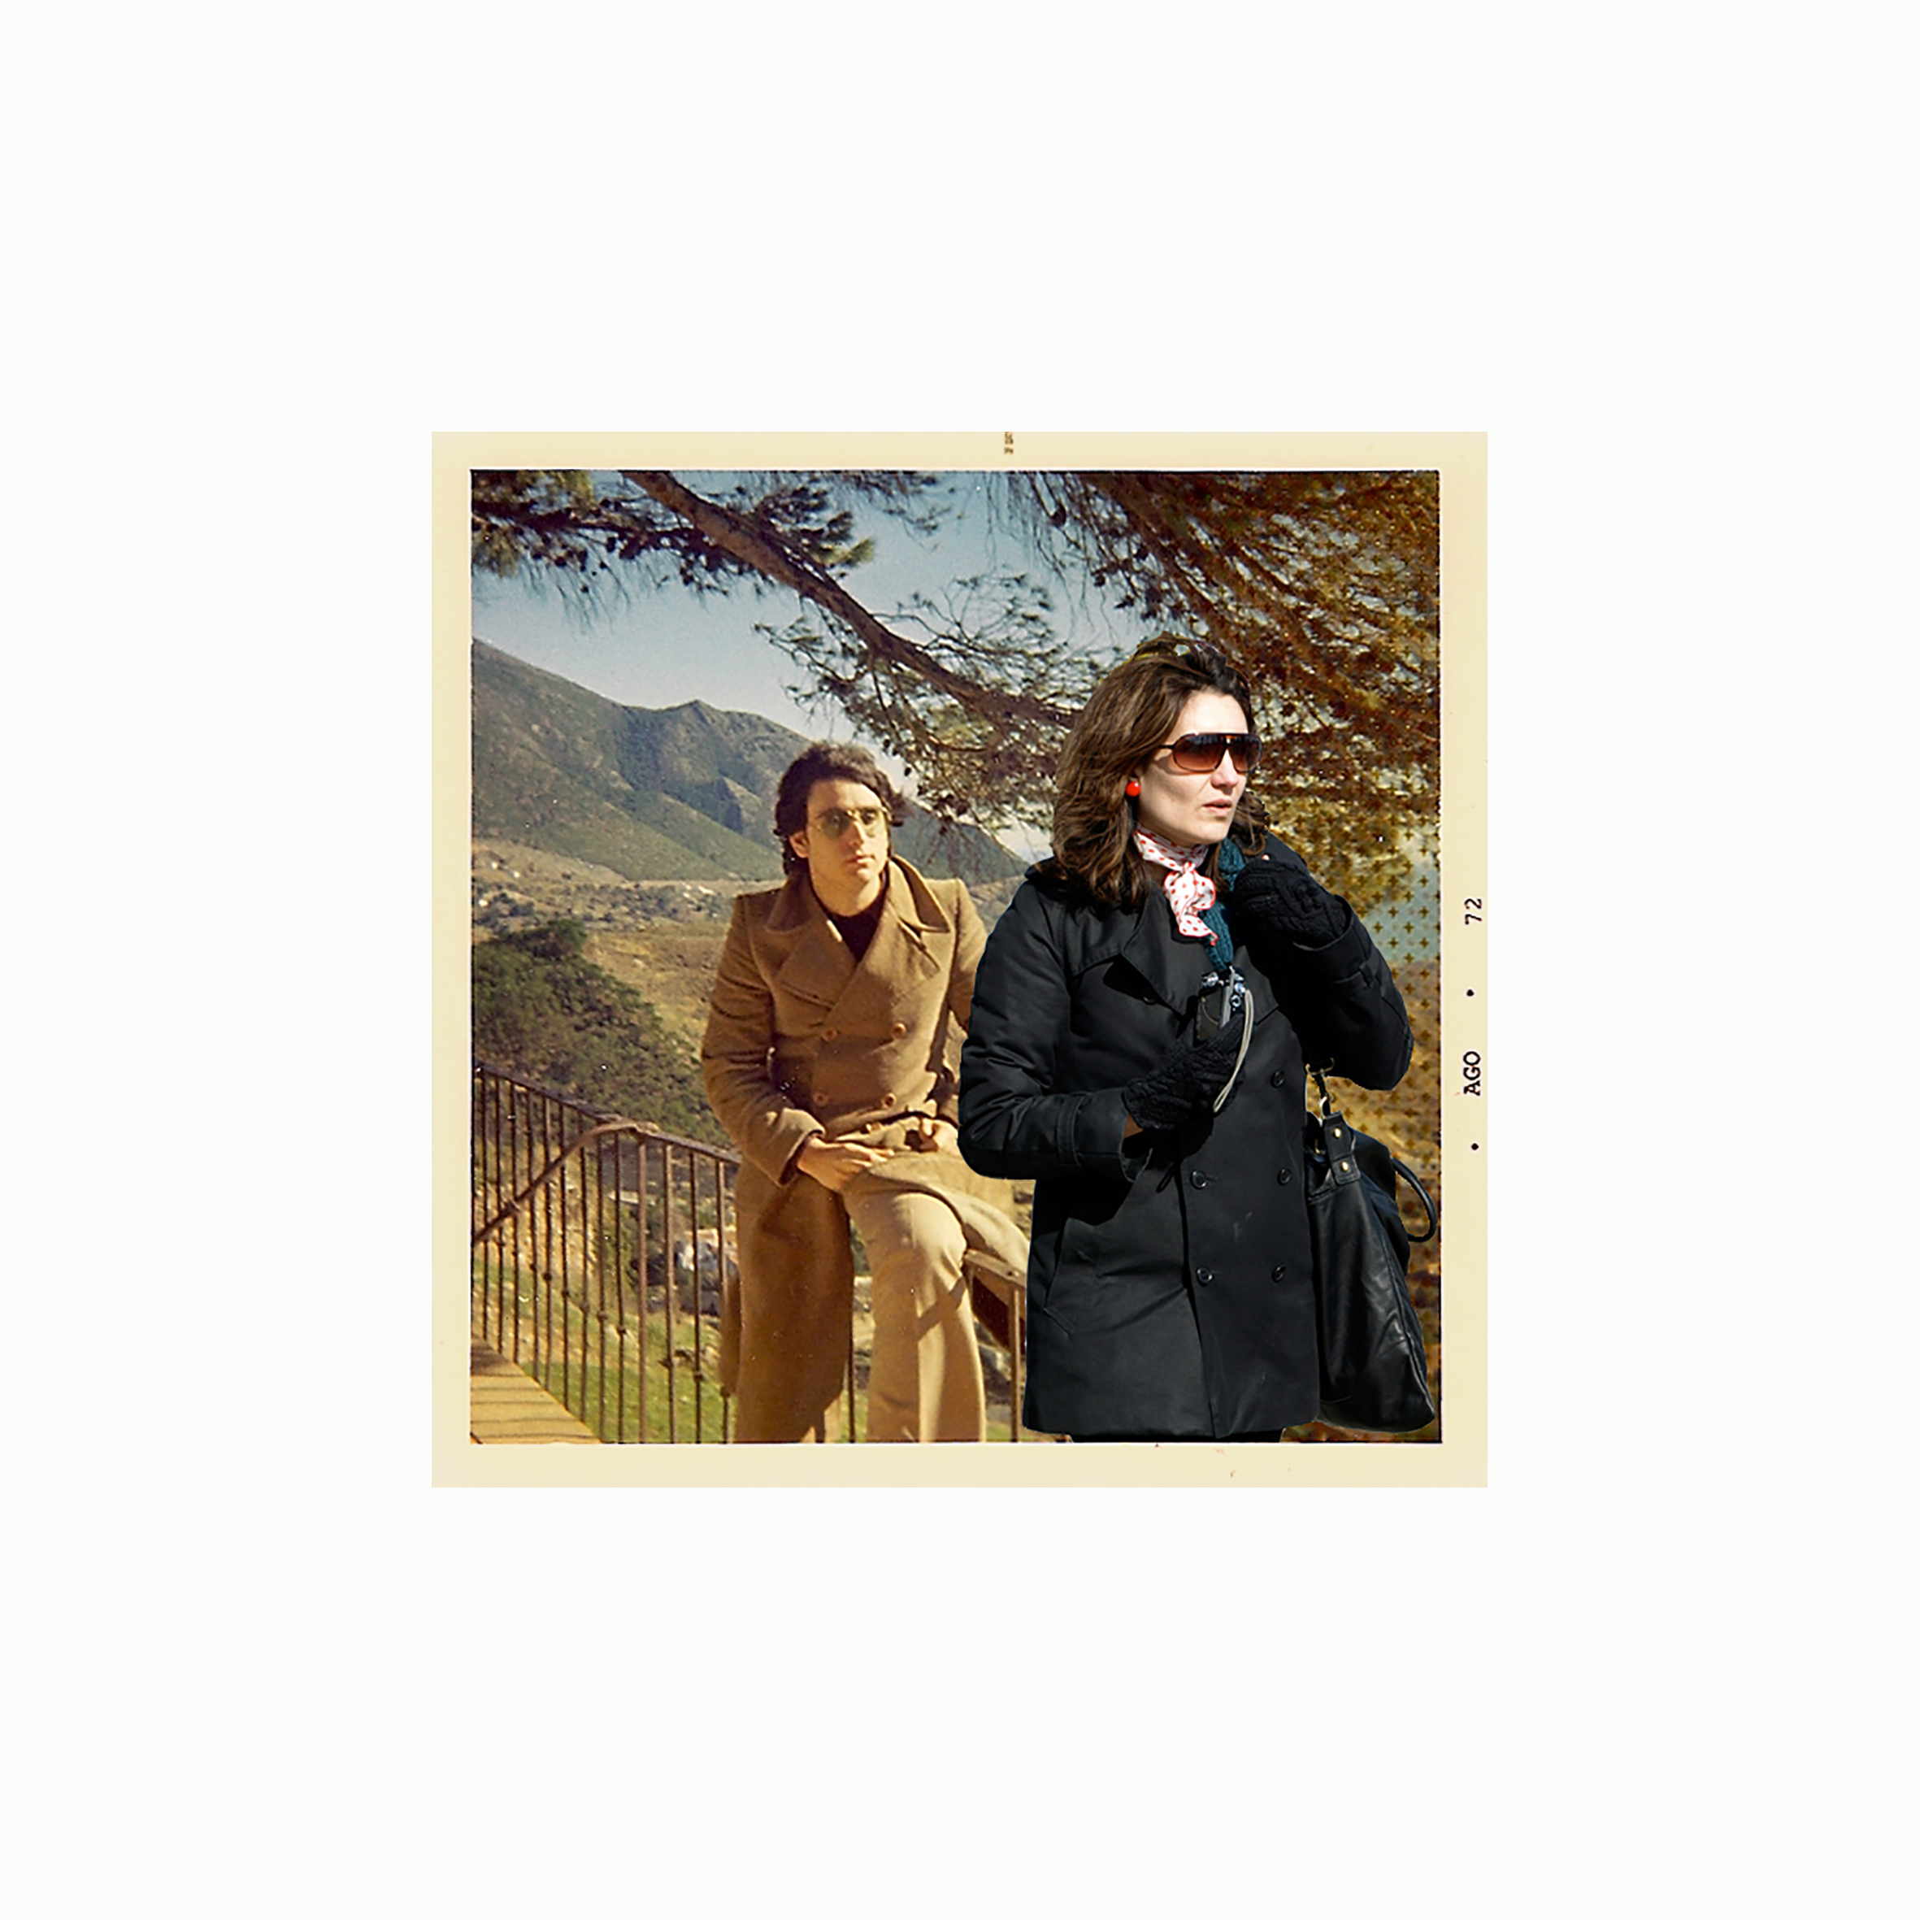 Family Album II, 2018. 20x20cm. #2